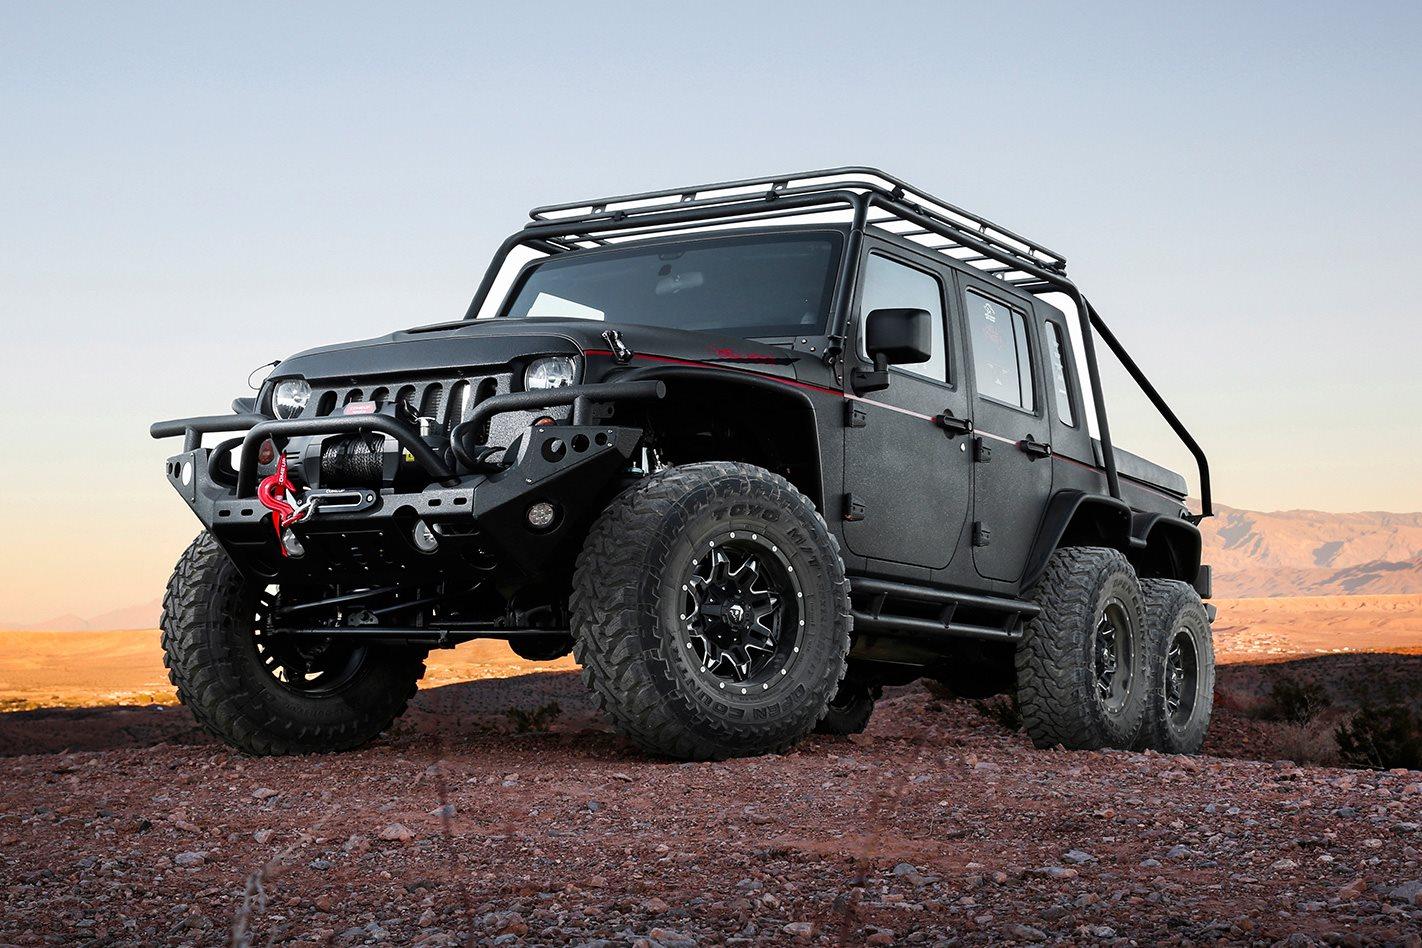 Custom 4x4 6x6 Hellhog Jeep Wrangler